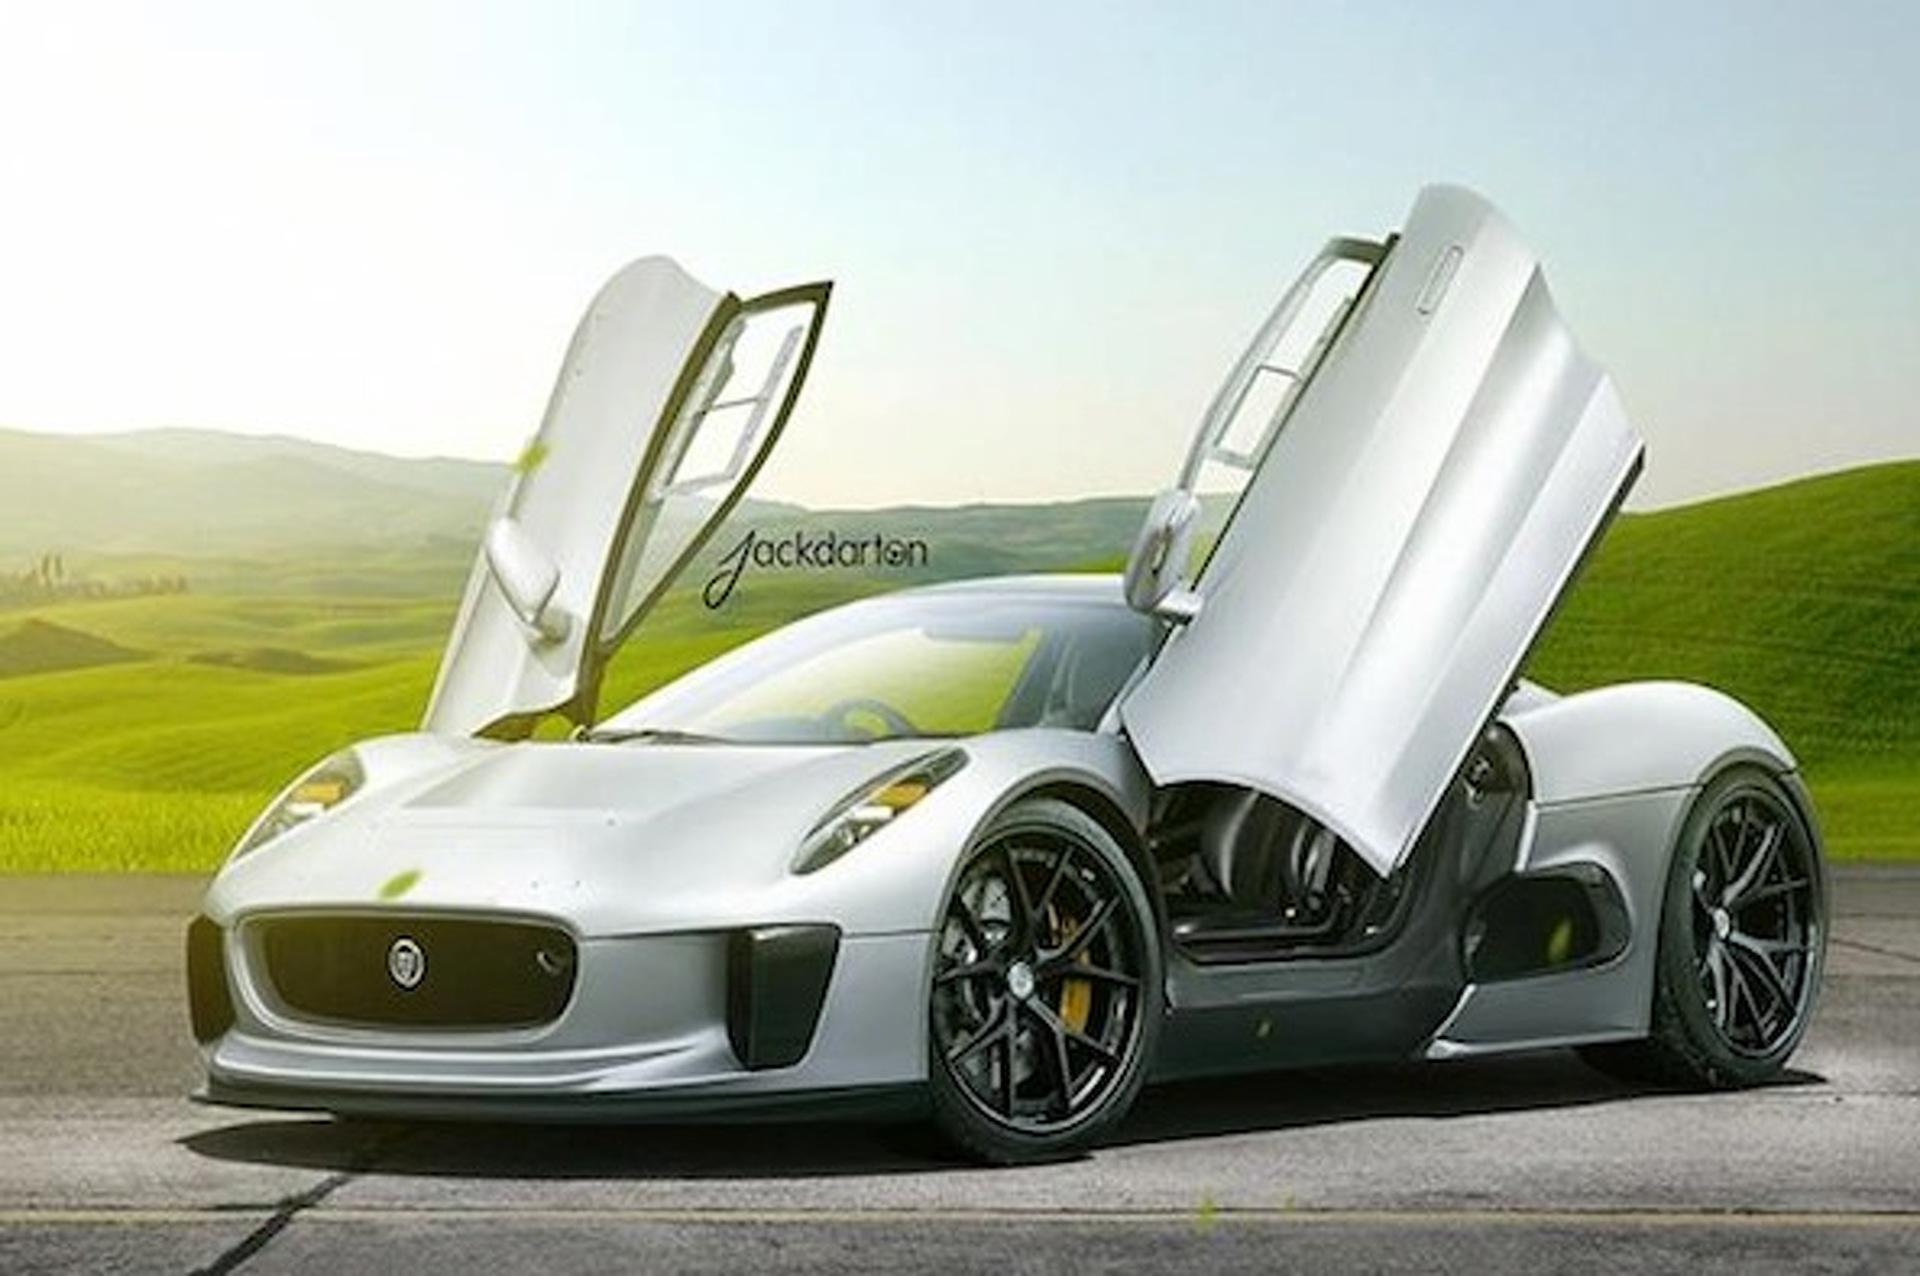 Jaguar C-X75 Gets Crafted Onto a Set of HRE Wheels